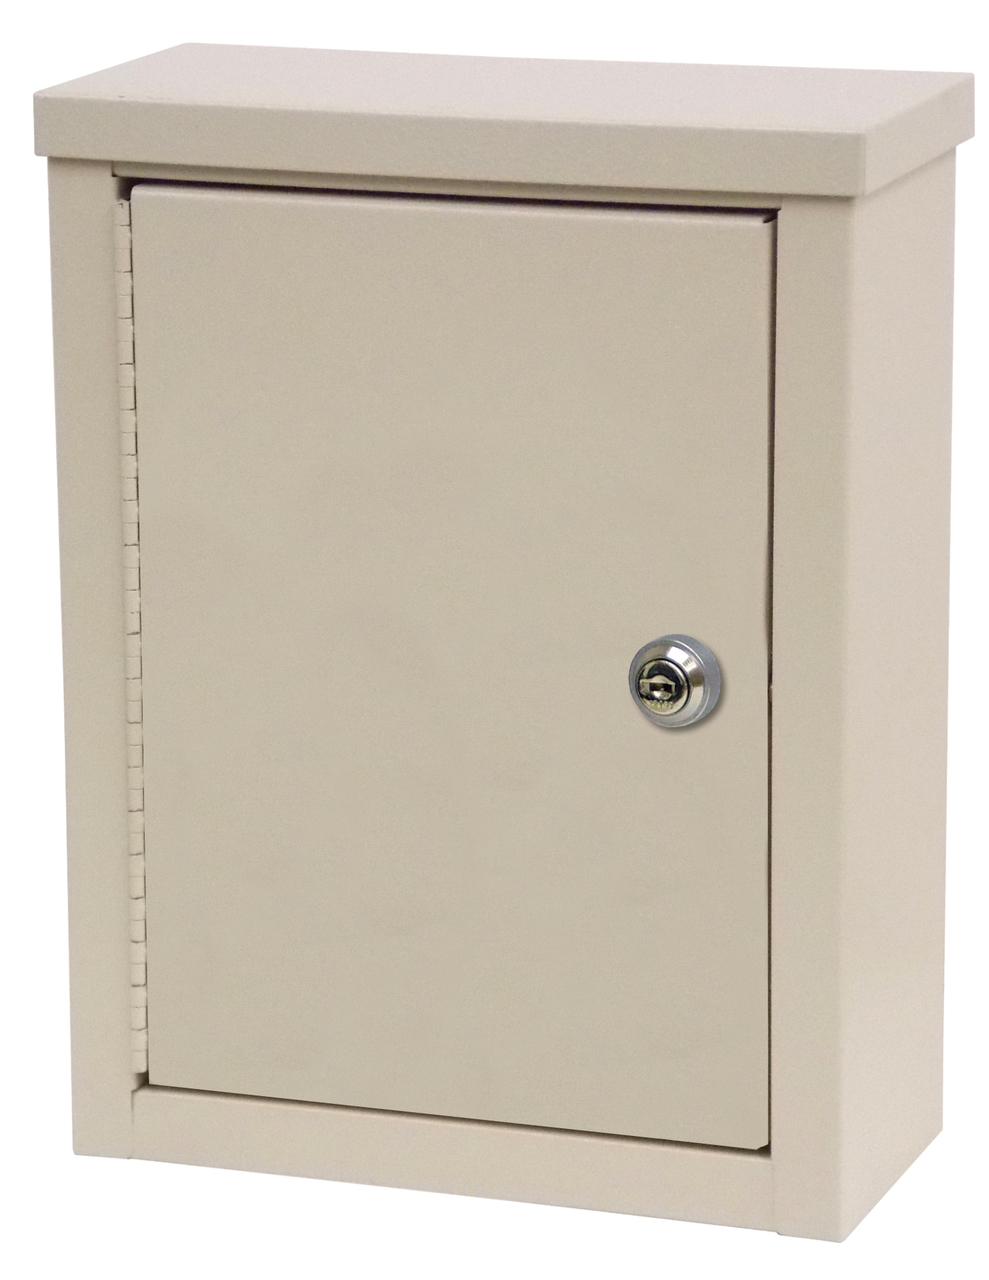 Mini Wall Storage Cabinets (291609) - Omnimed